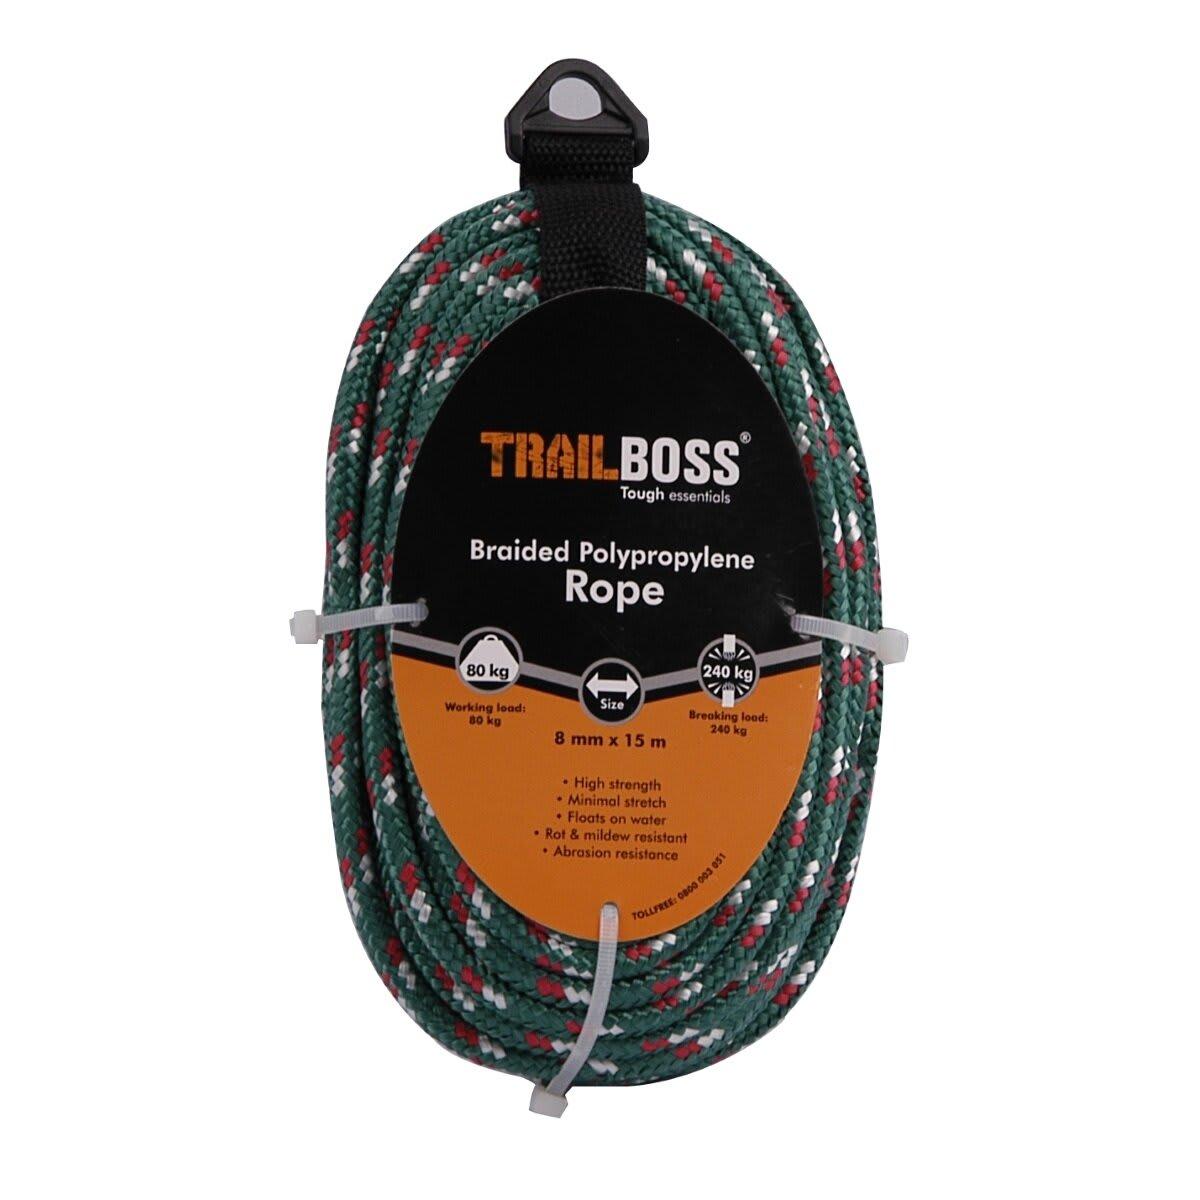 TrailBoss 8mm x 15m Braided Polypropylene Rope